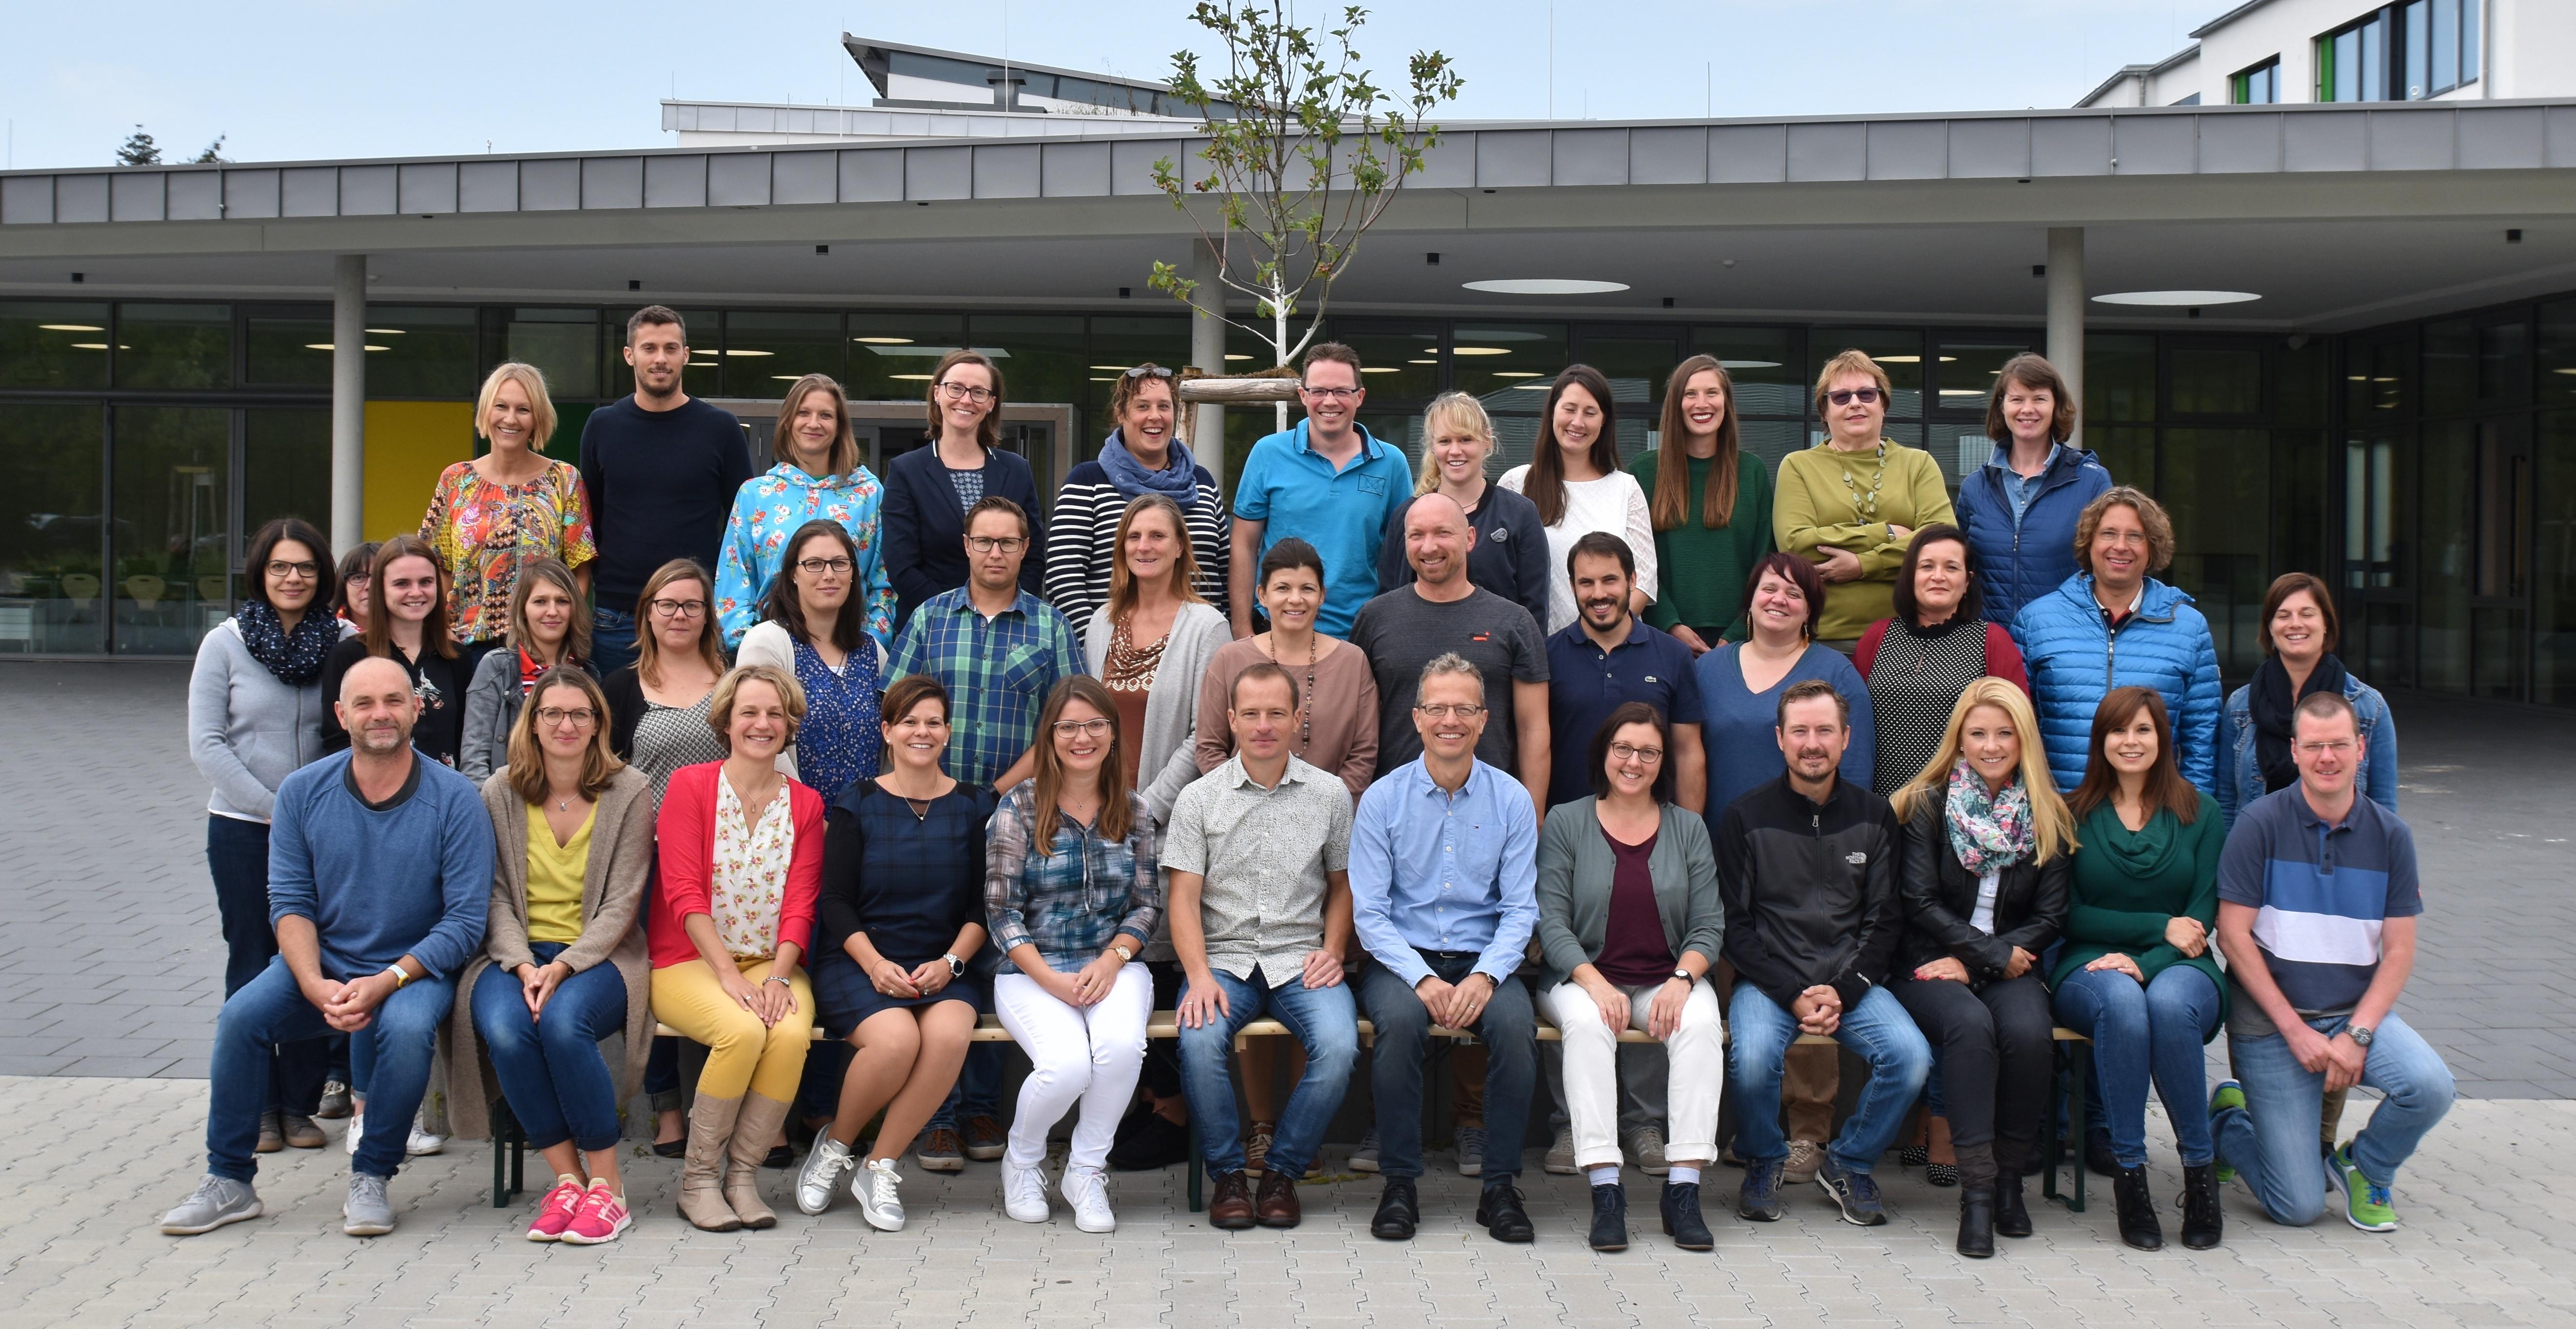 Lehrerfoto 2019/2020